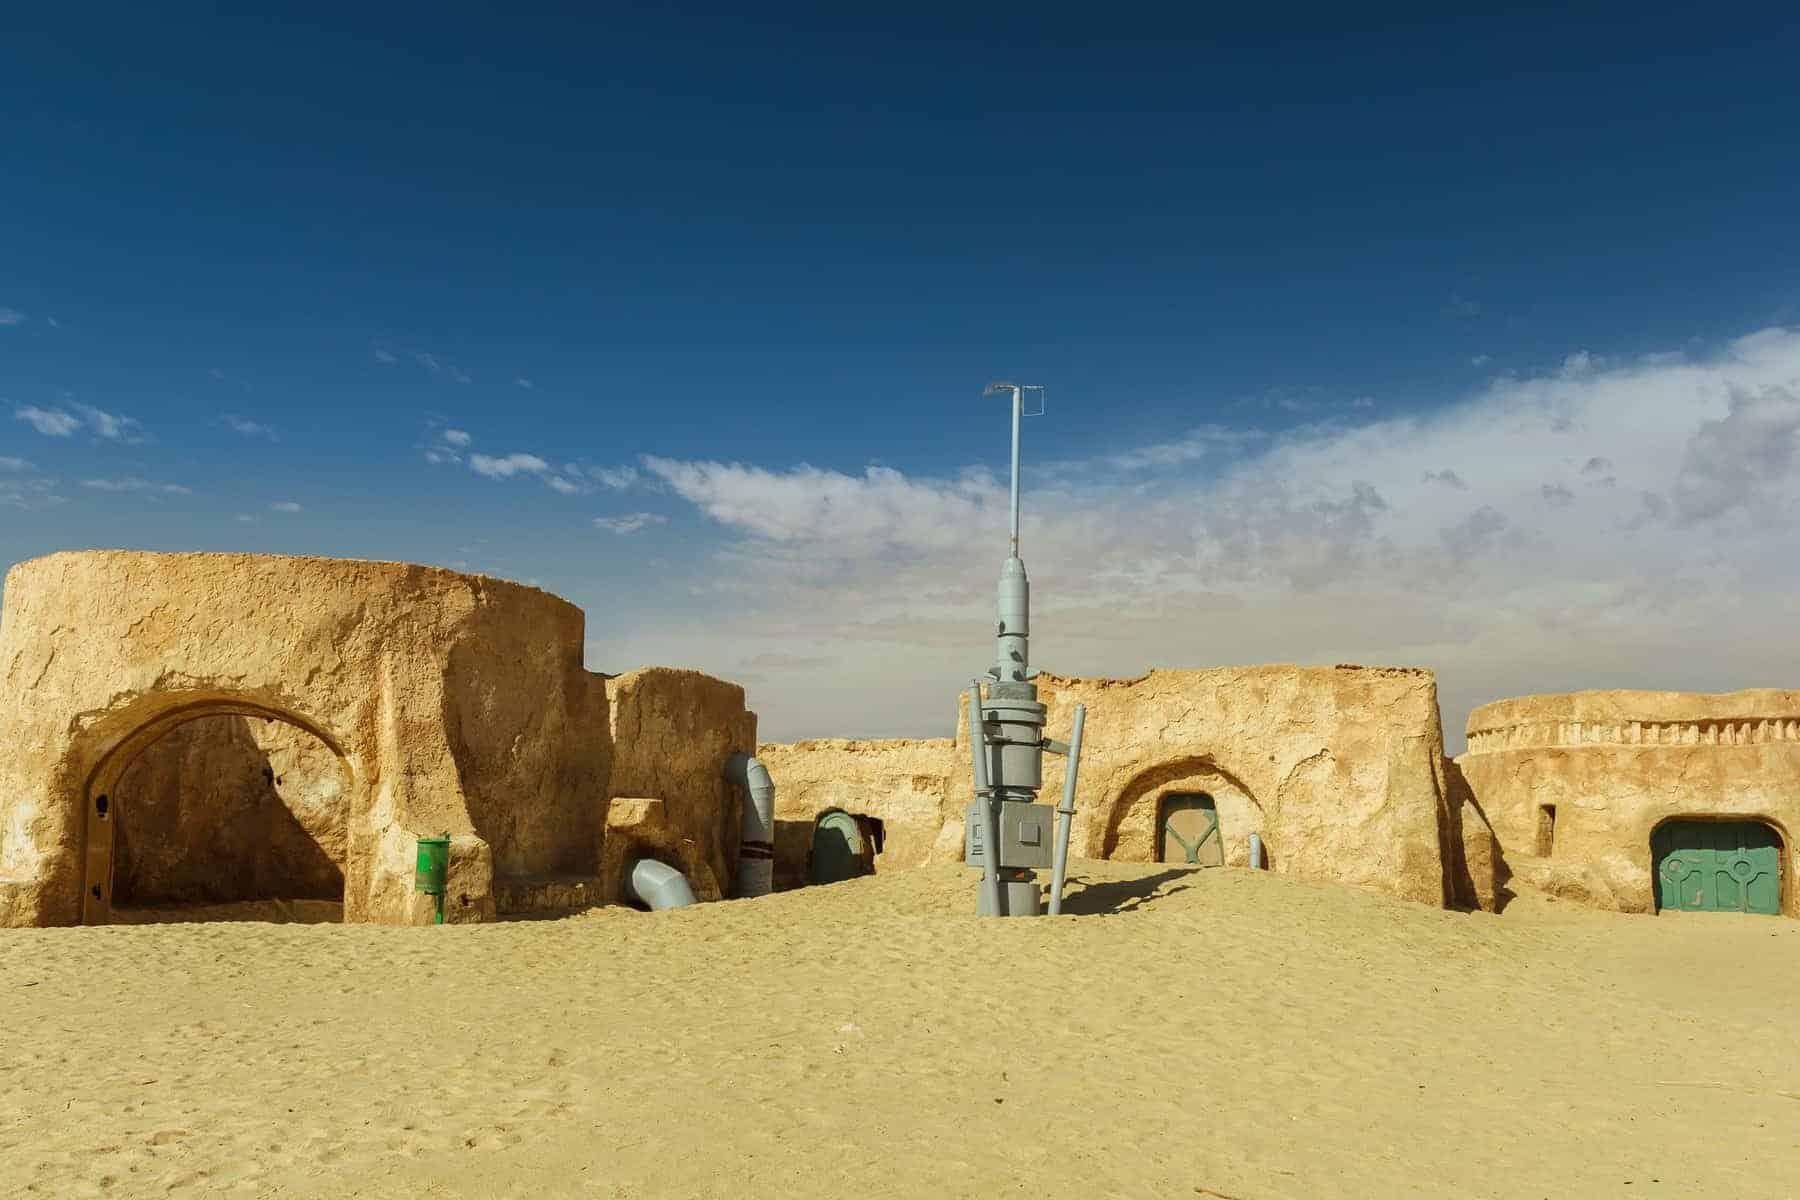 NEFTA TUNISIA - SEP 19 Original movie scenery for Star Wars A New Hope near Nefta city in the Sahara desert Tunisia September 19 2016